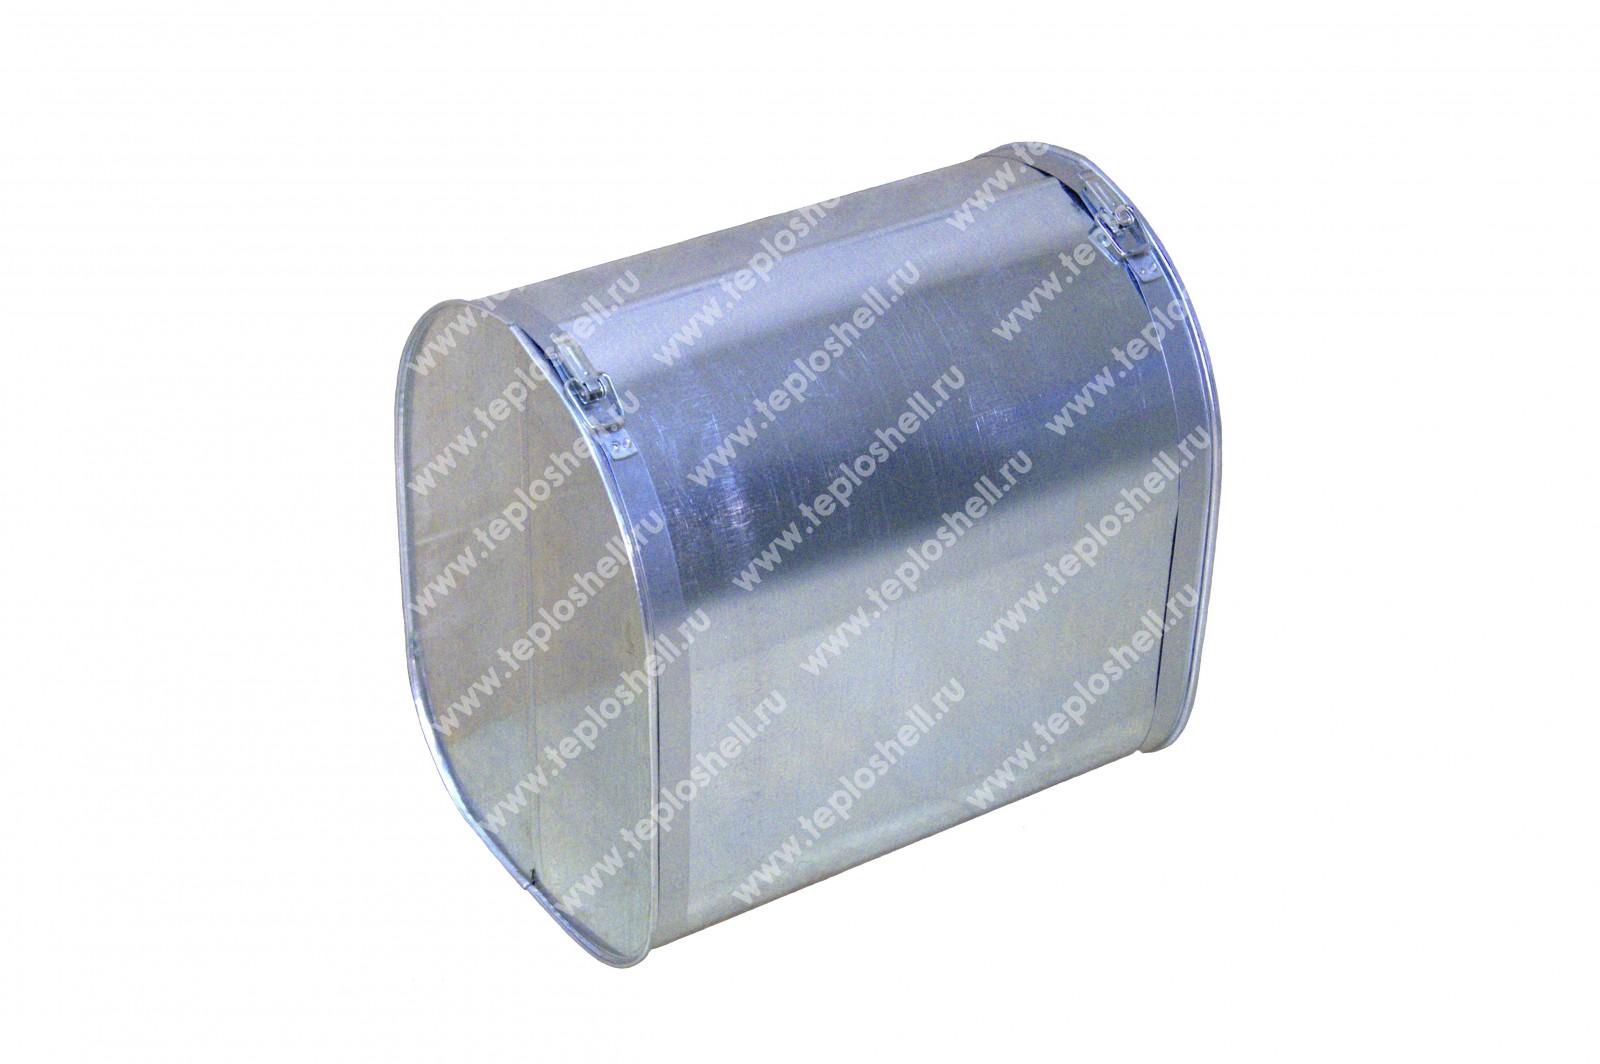 Короб Съемный для теплоизоляции